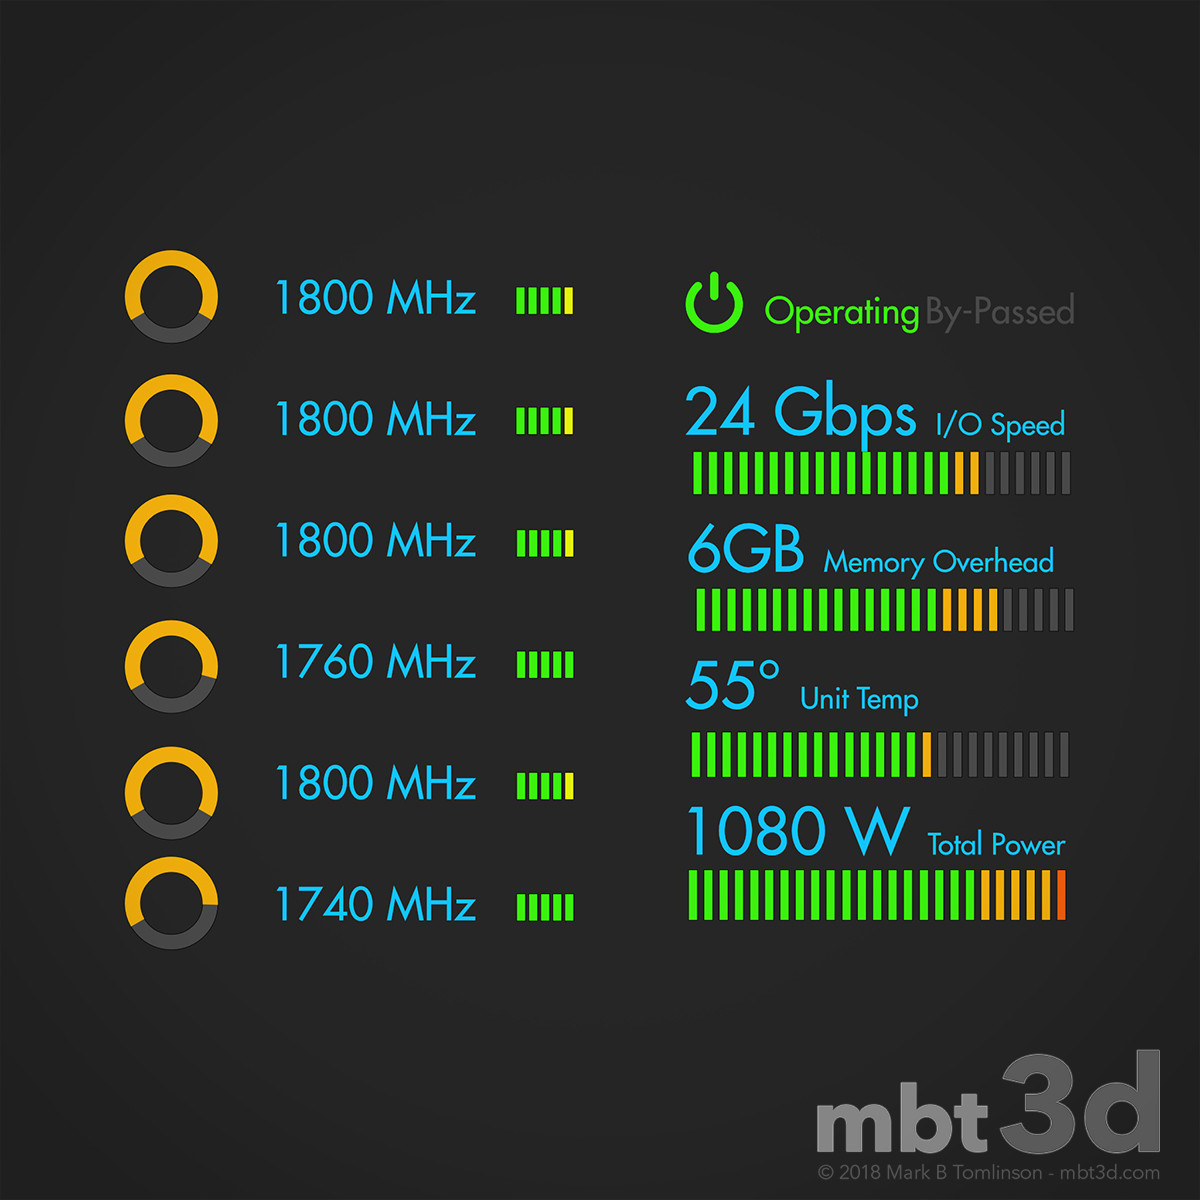 Box XXVI: eGPU Display Texture Diffuse / Luminance Color